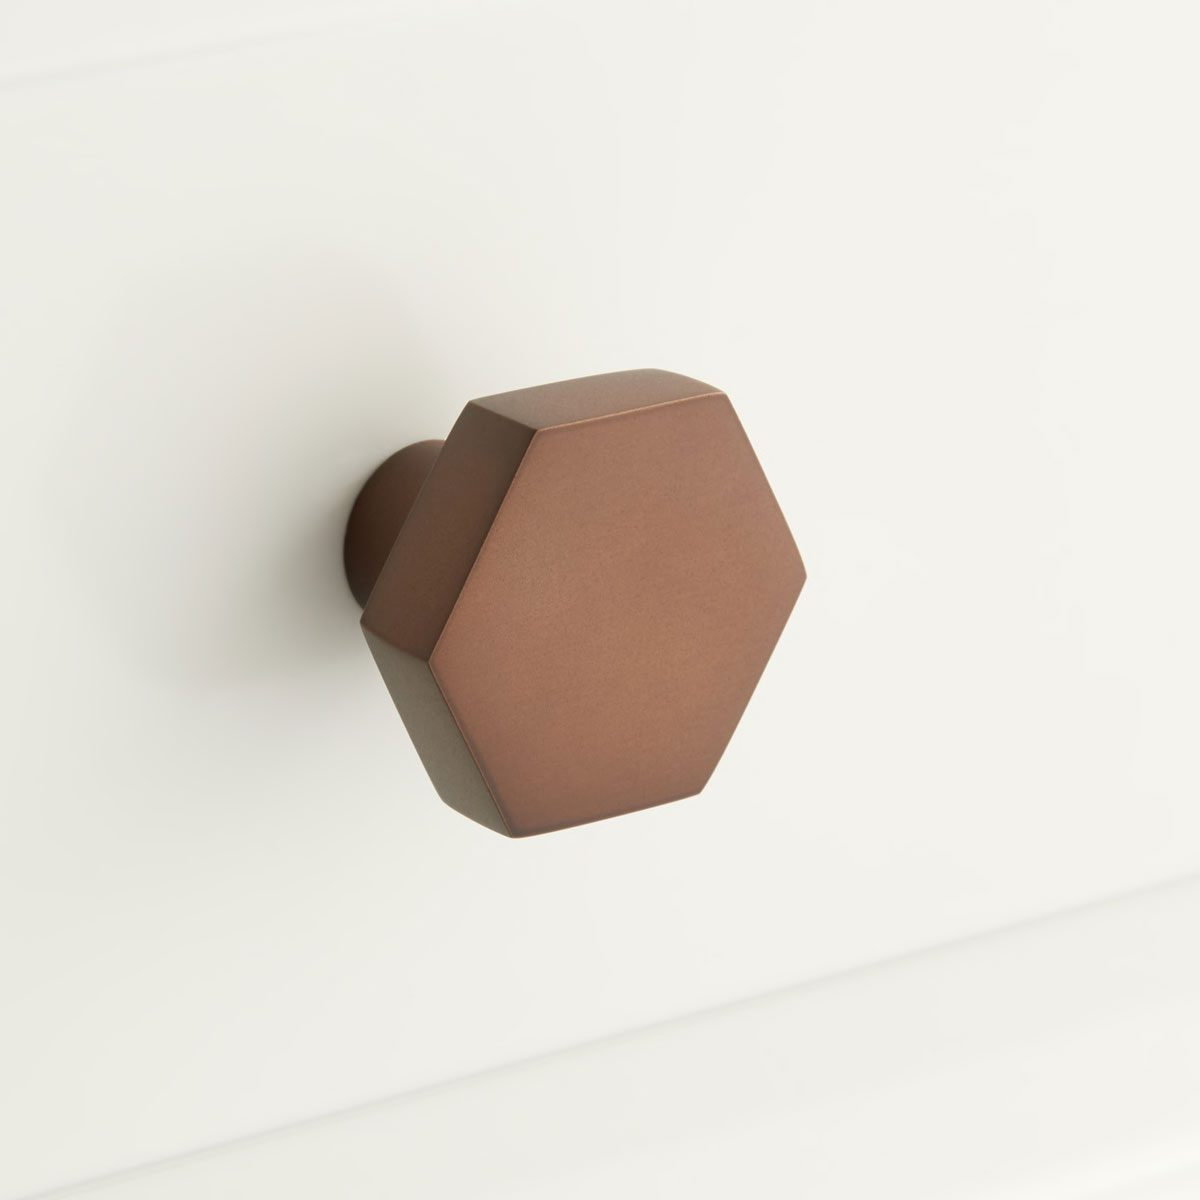 Cabinet Hardware 512905 Brass Knob Oil Rubbed Broonze Geometric.jpg